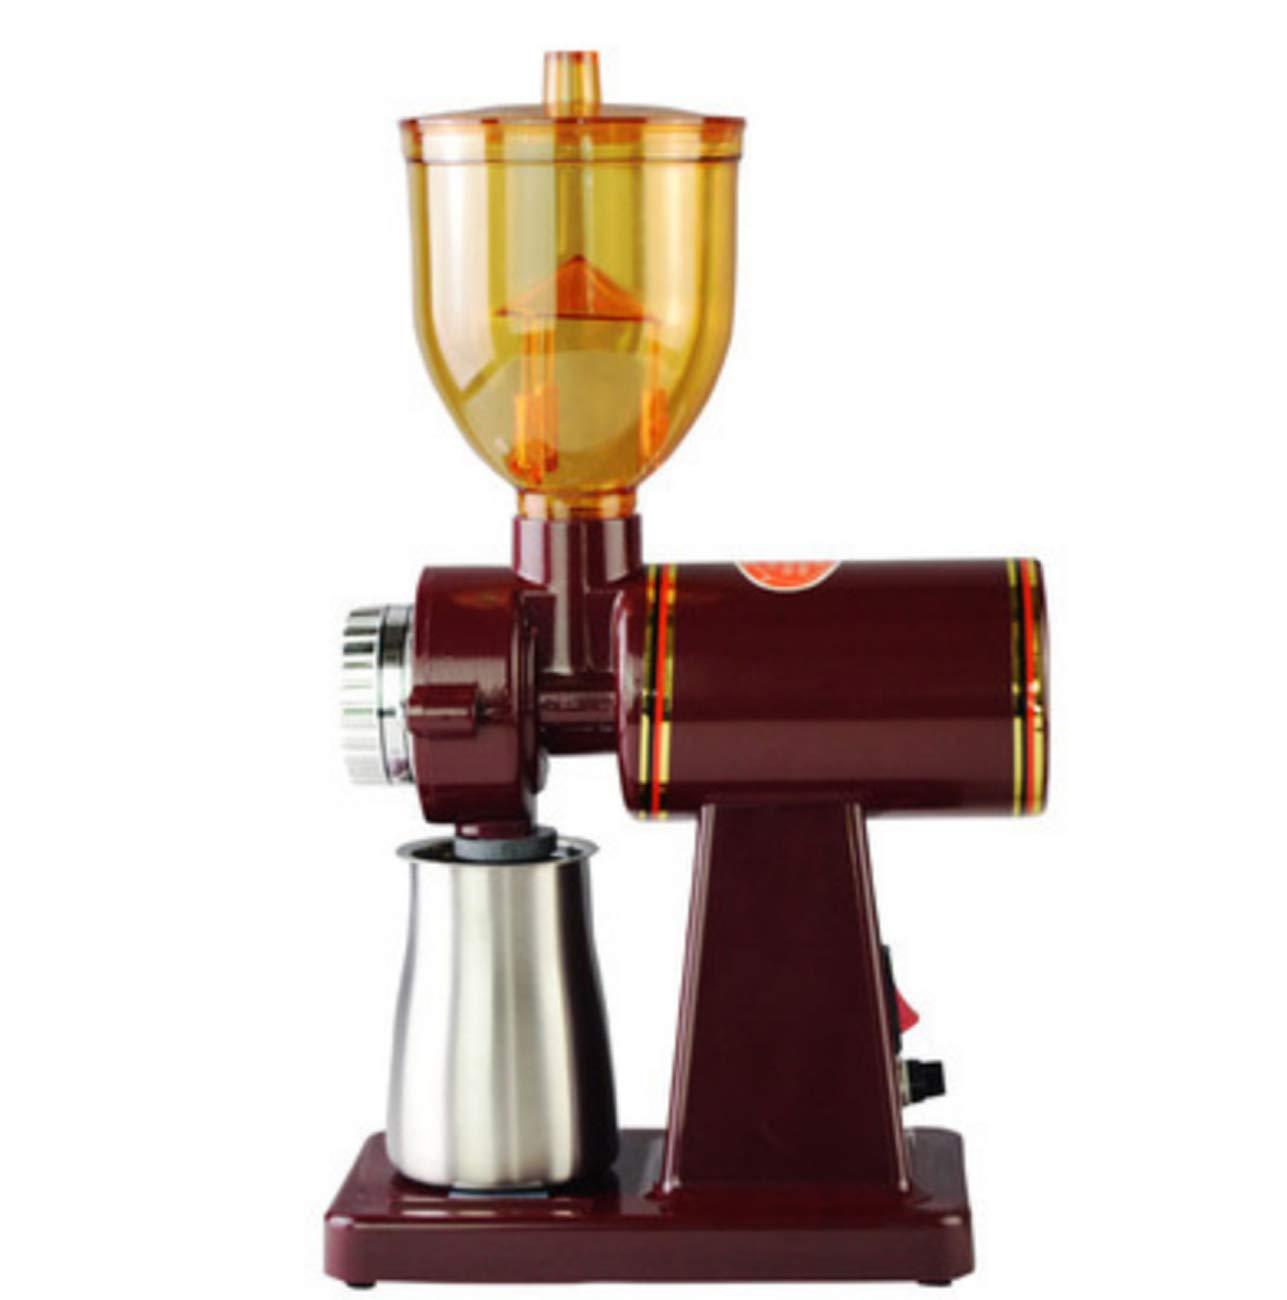 Huaishu Home Kaffee Schleifer Elektro-Kaffeebohnen Schleifer 110V/220V,ROT,110V